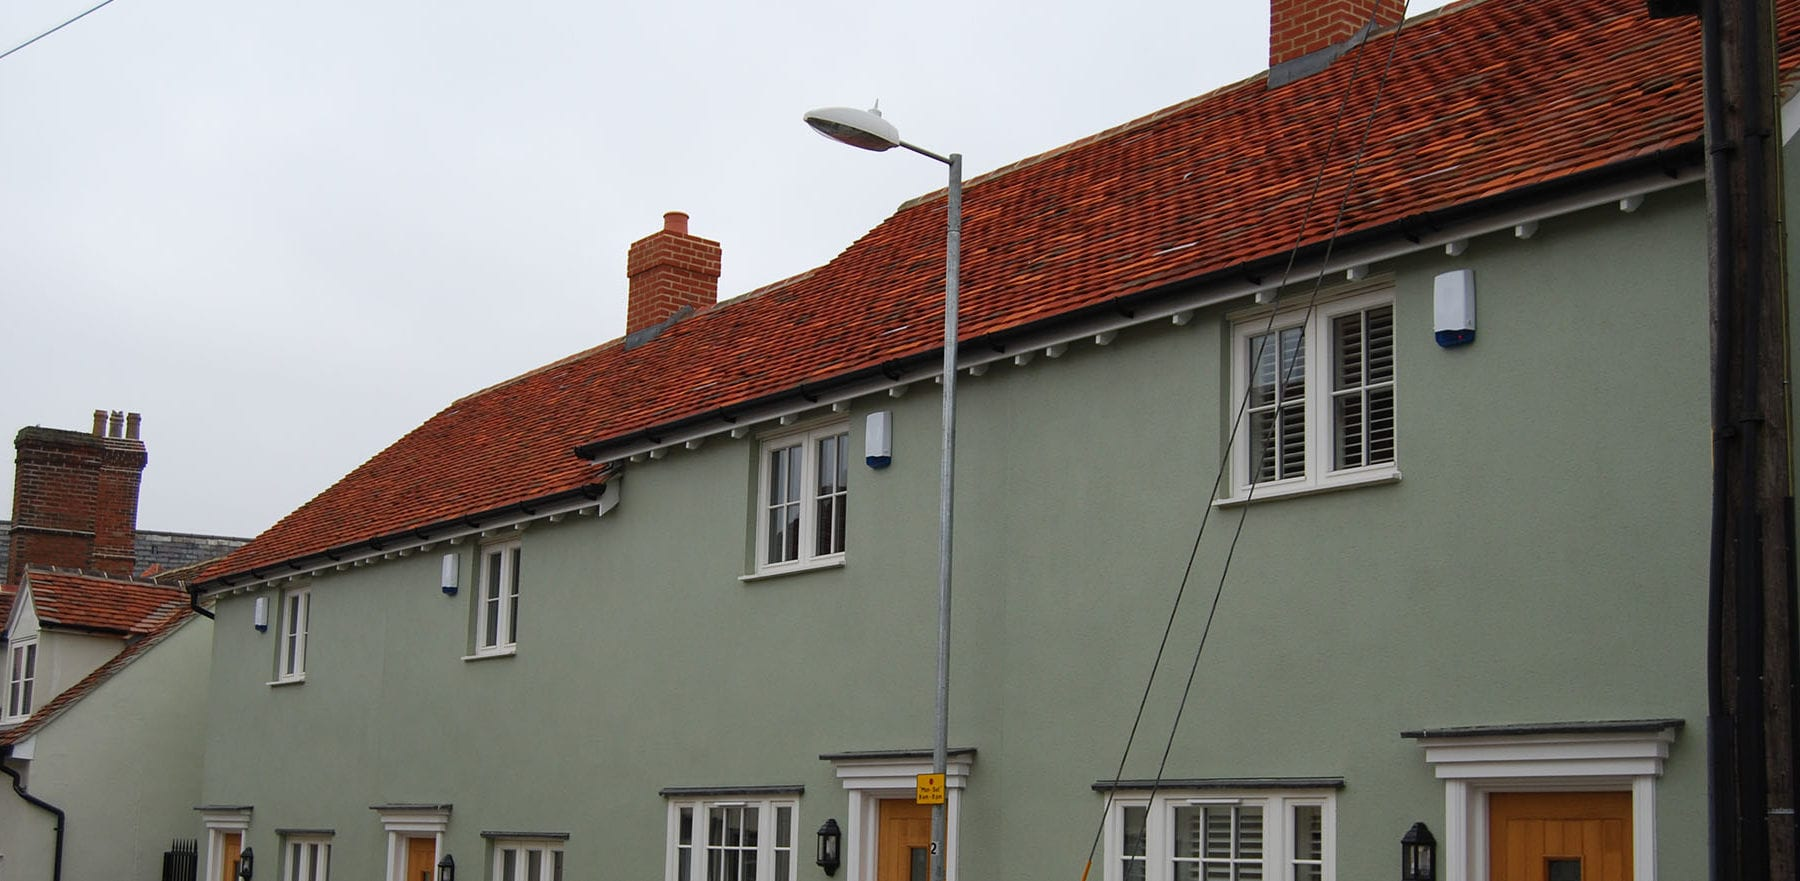 Lifestiles - Handmade Multi Clay Roof Tiles - New Street, England 3